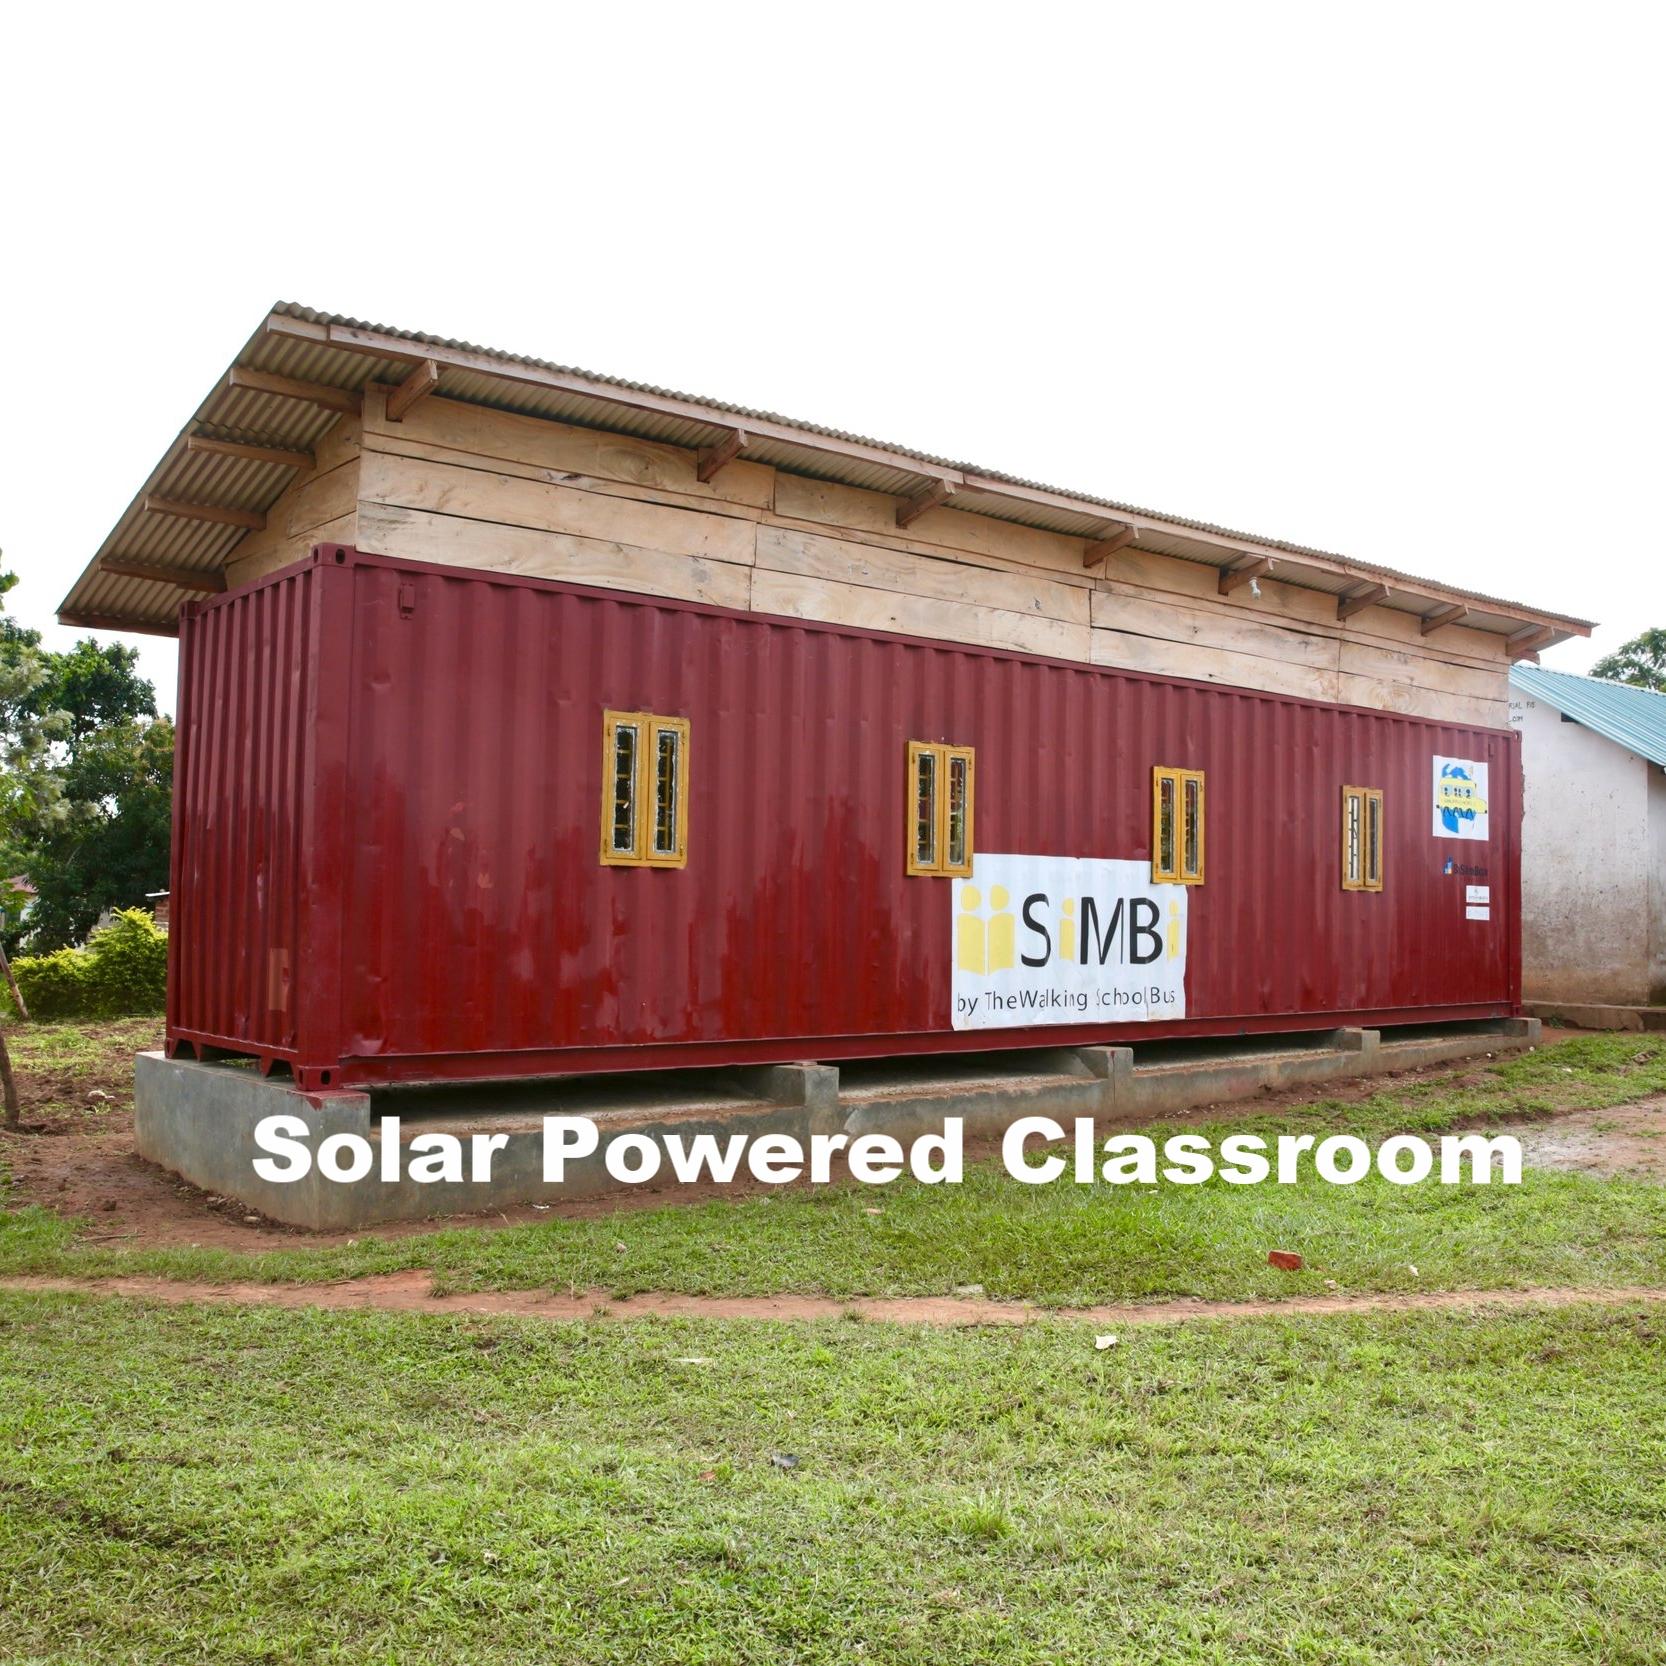 Solar Powered Classroom